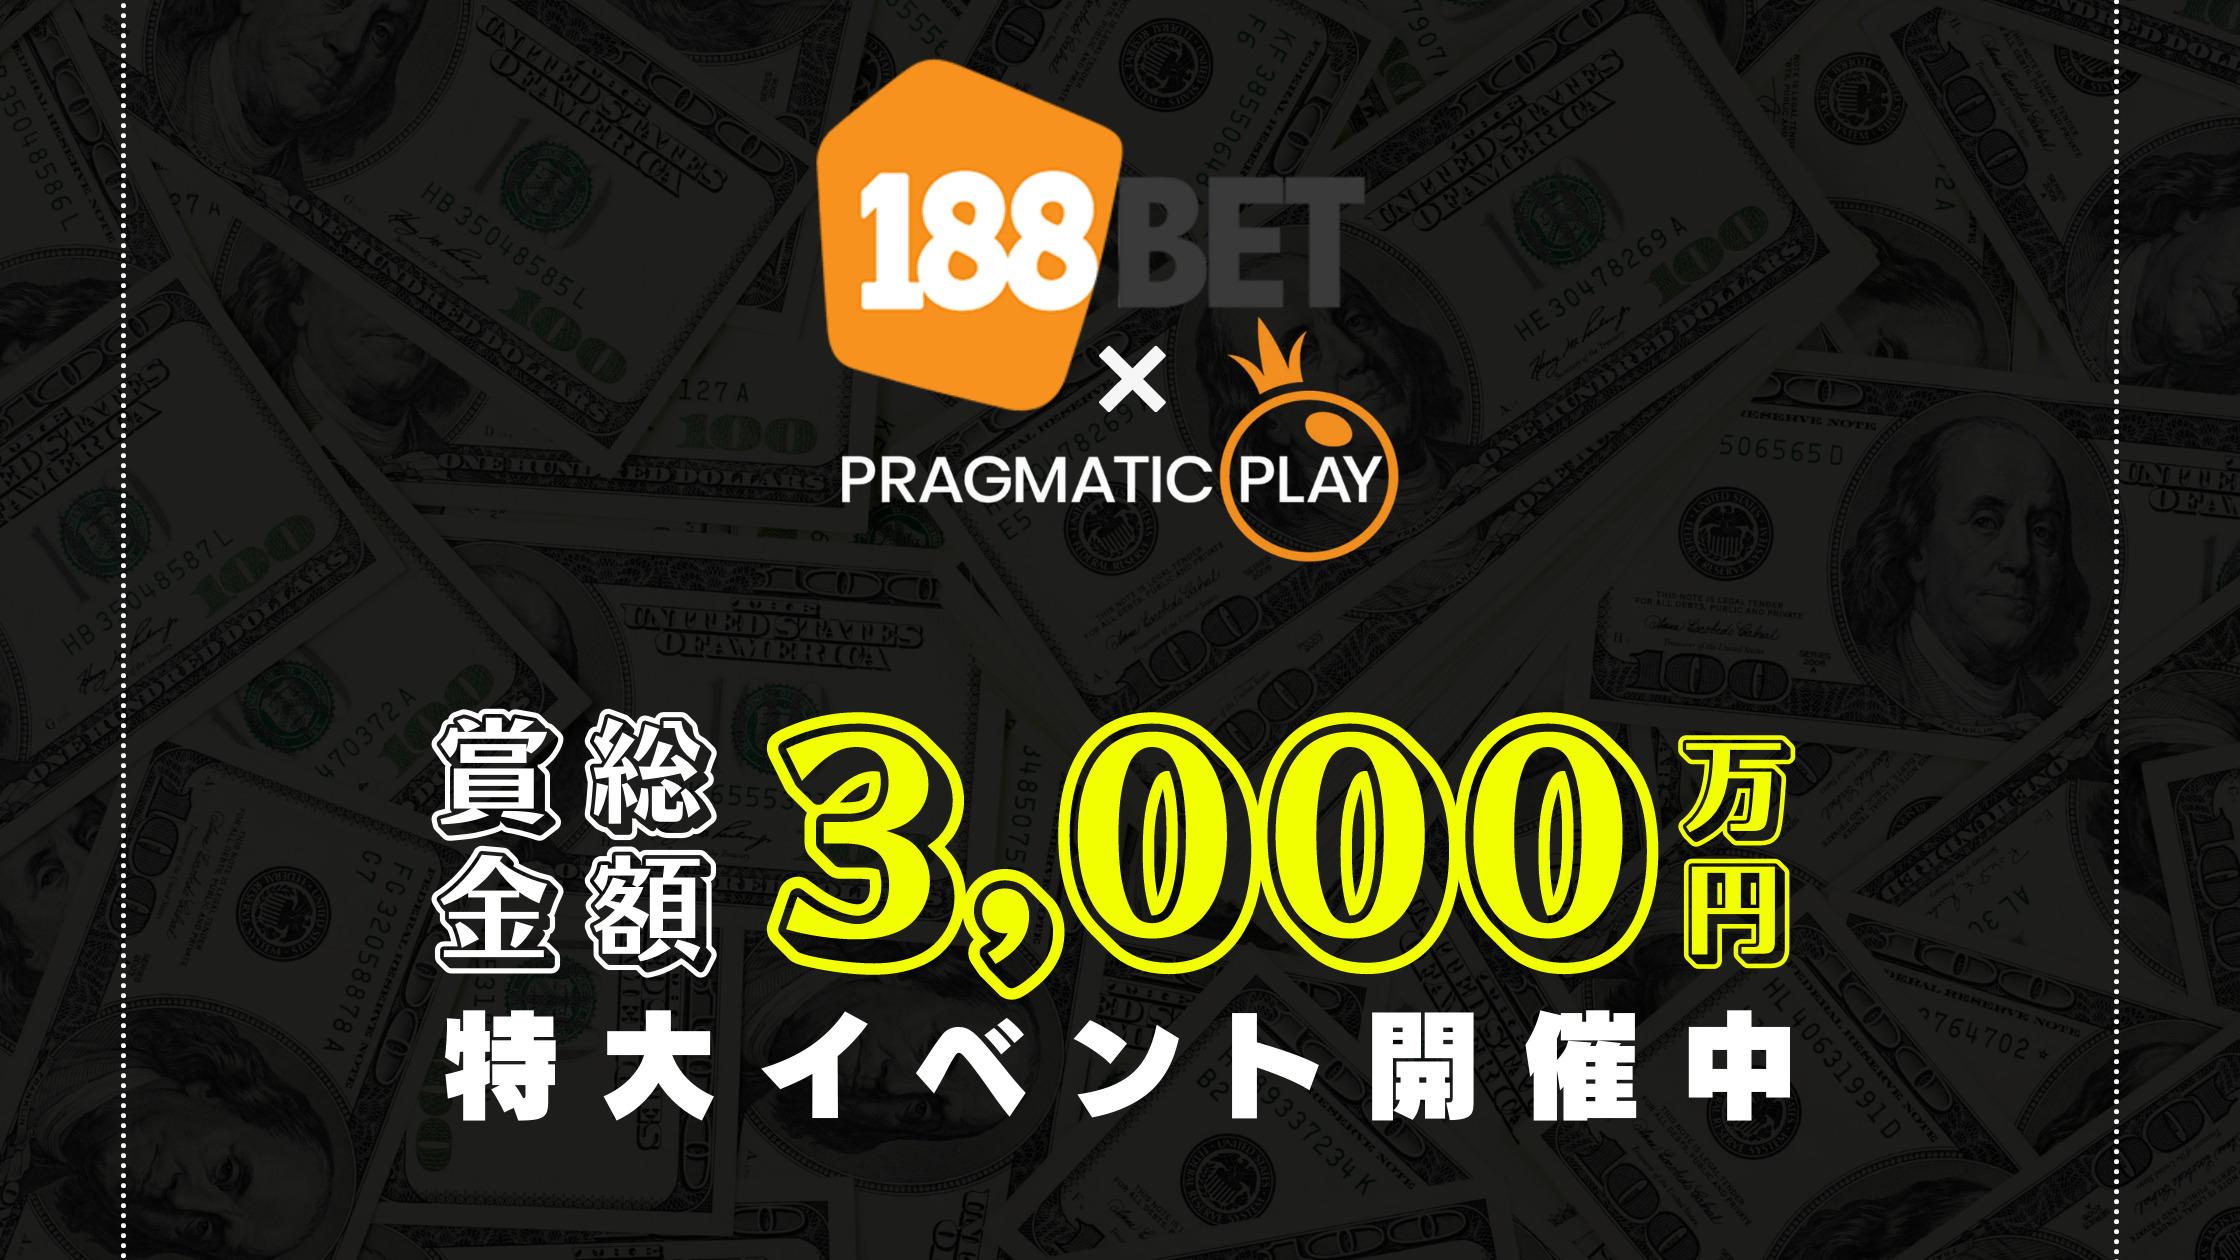 【188BET x プラグマ】総額3,000万円の特大イベント開催中!